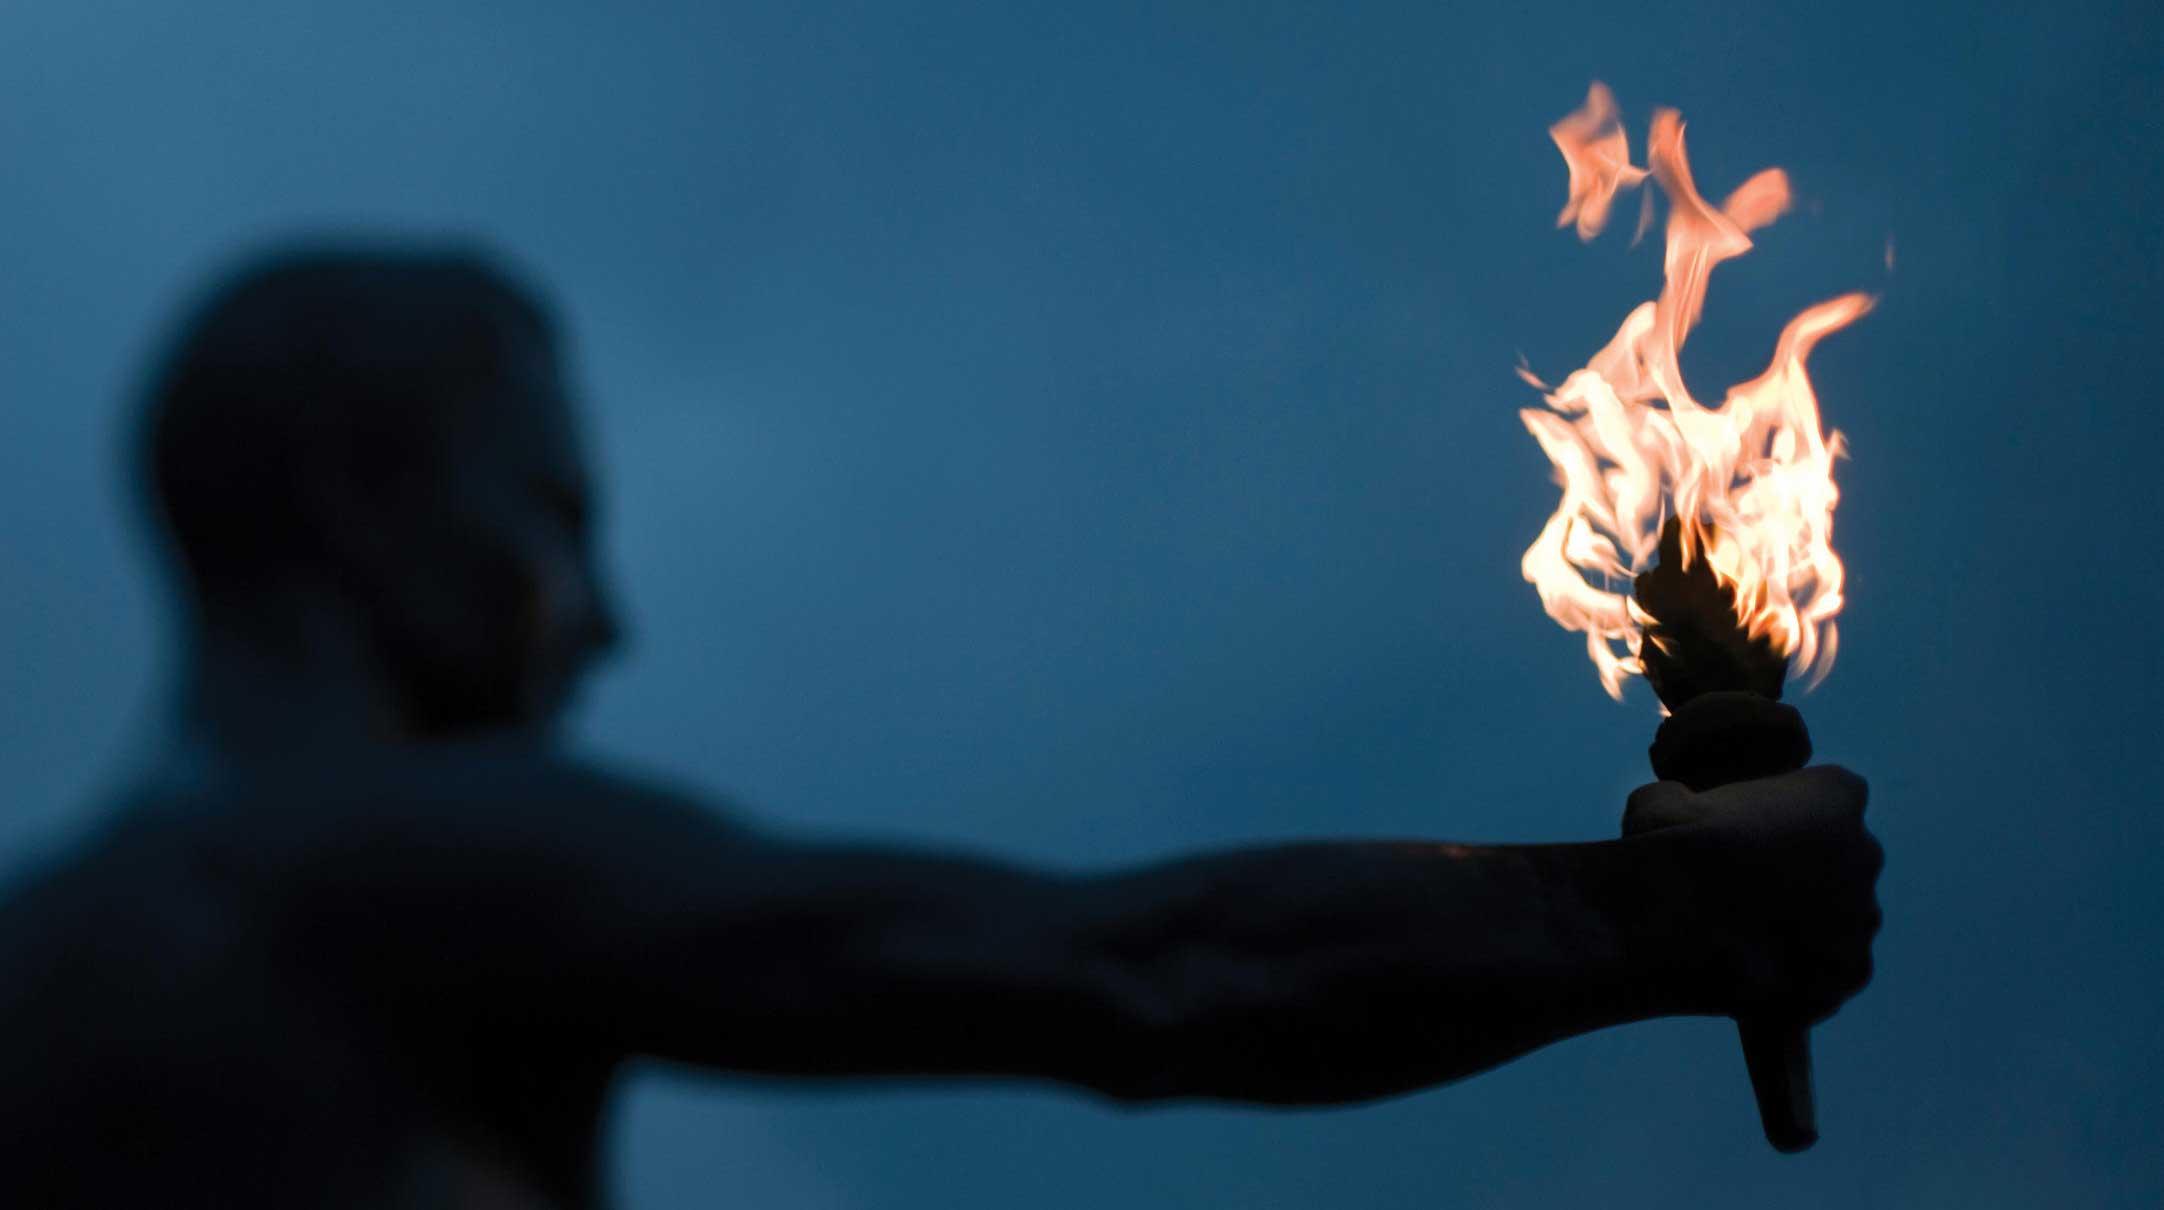 Torchbearer Image